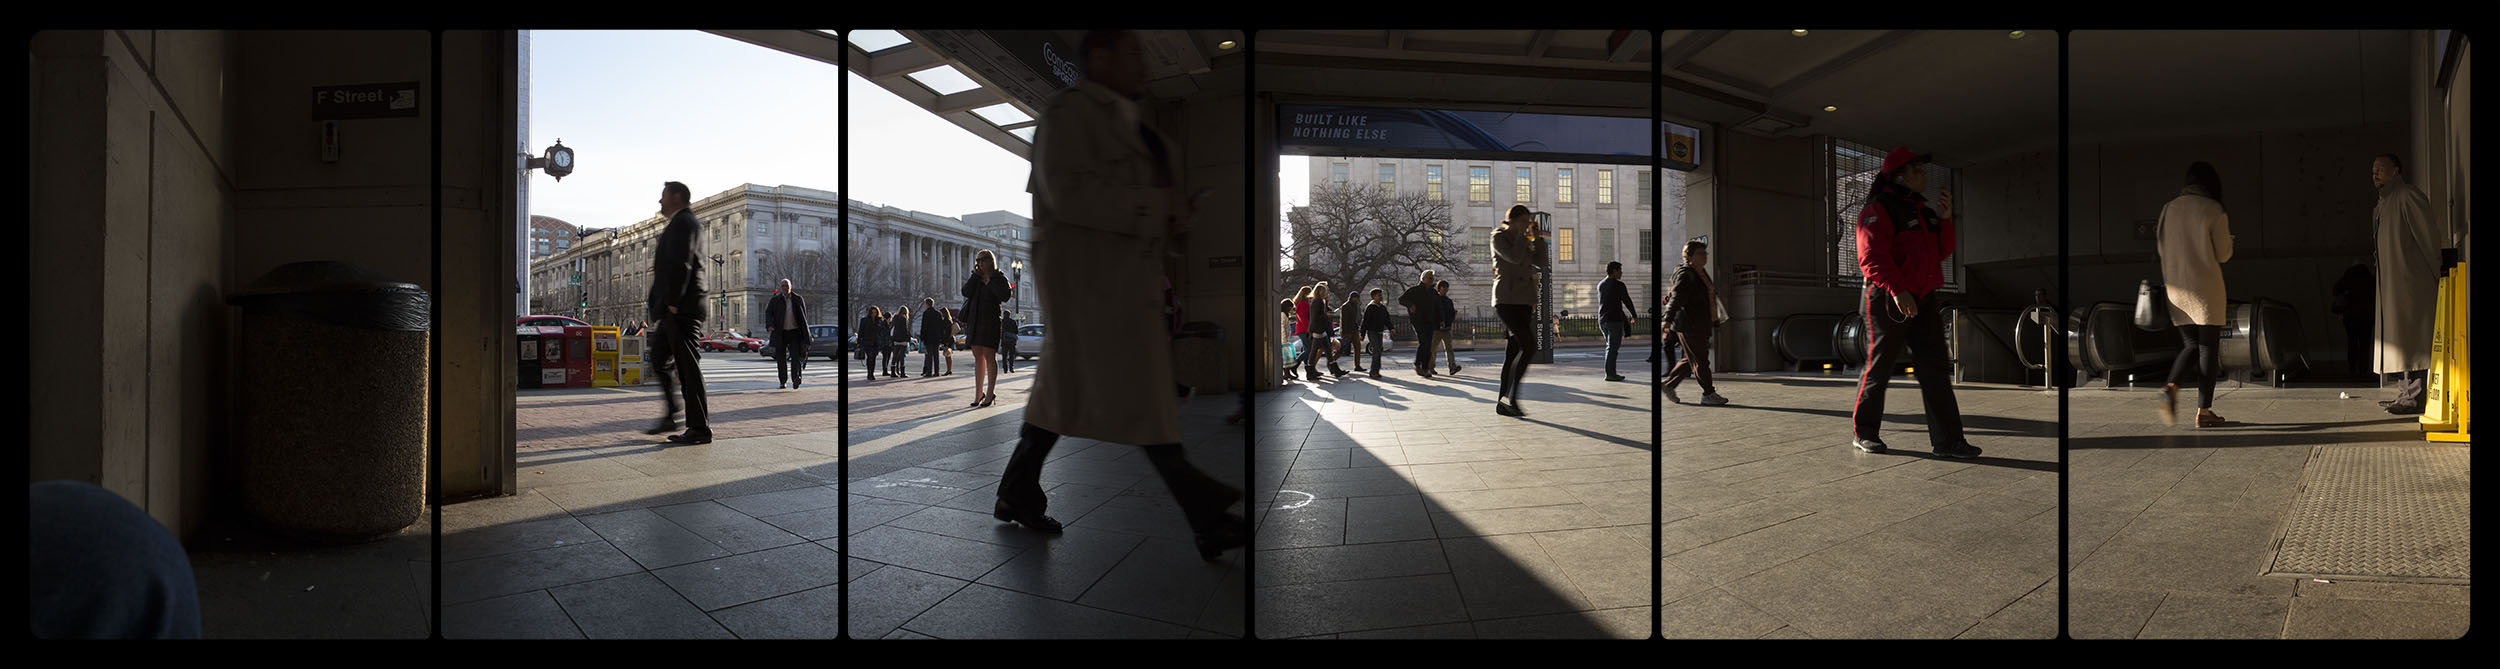 Metro Rail, Gallery Place-Chinatown, 3-25-2015-5079-5099